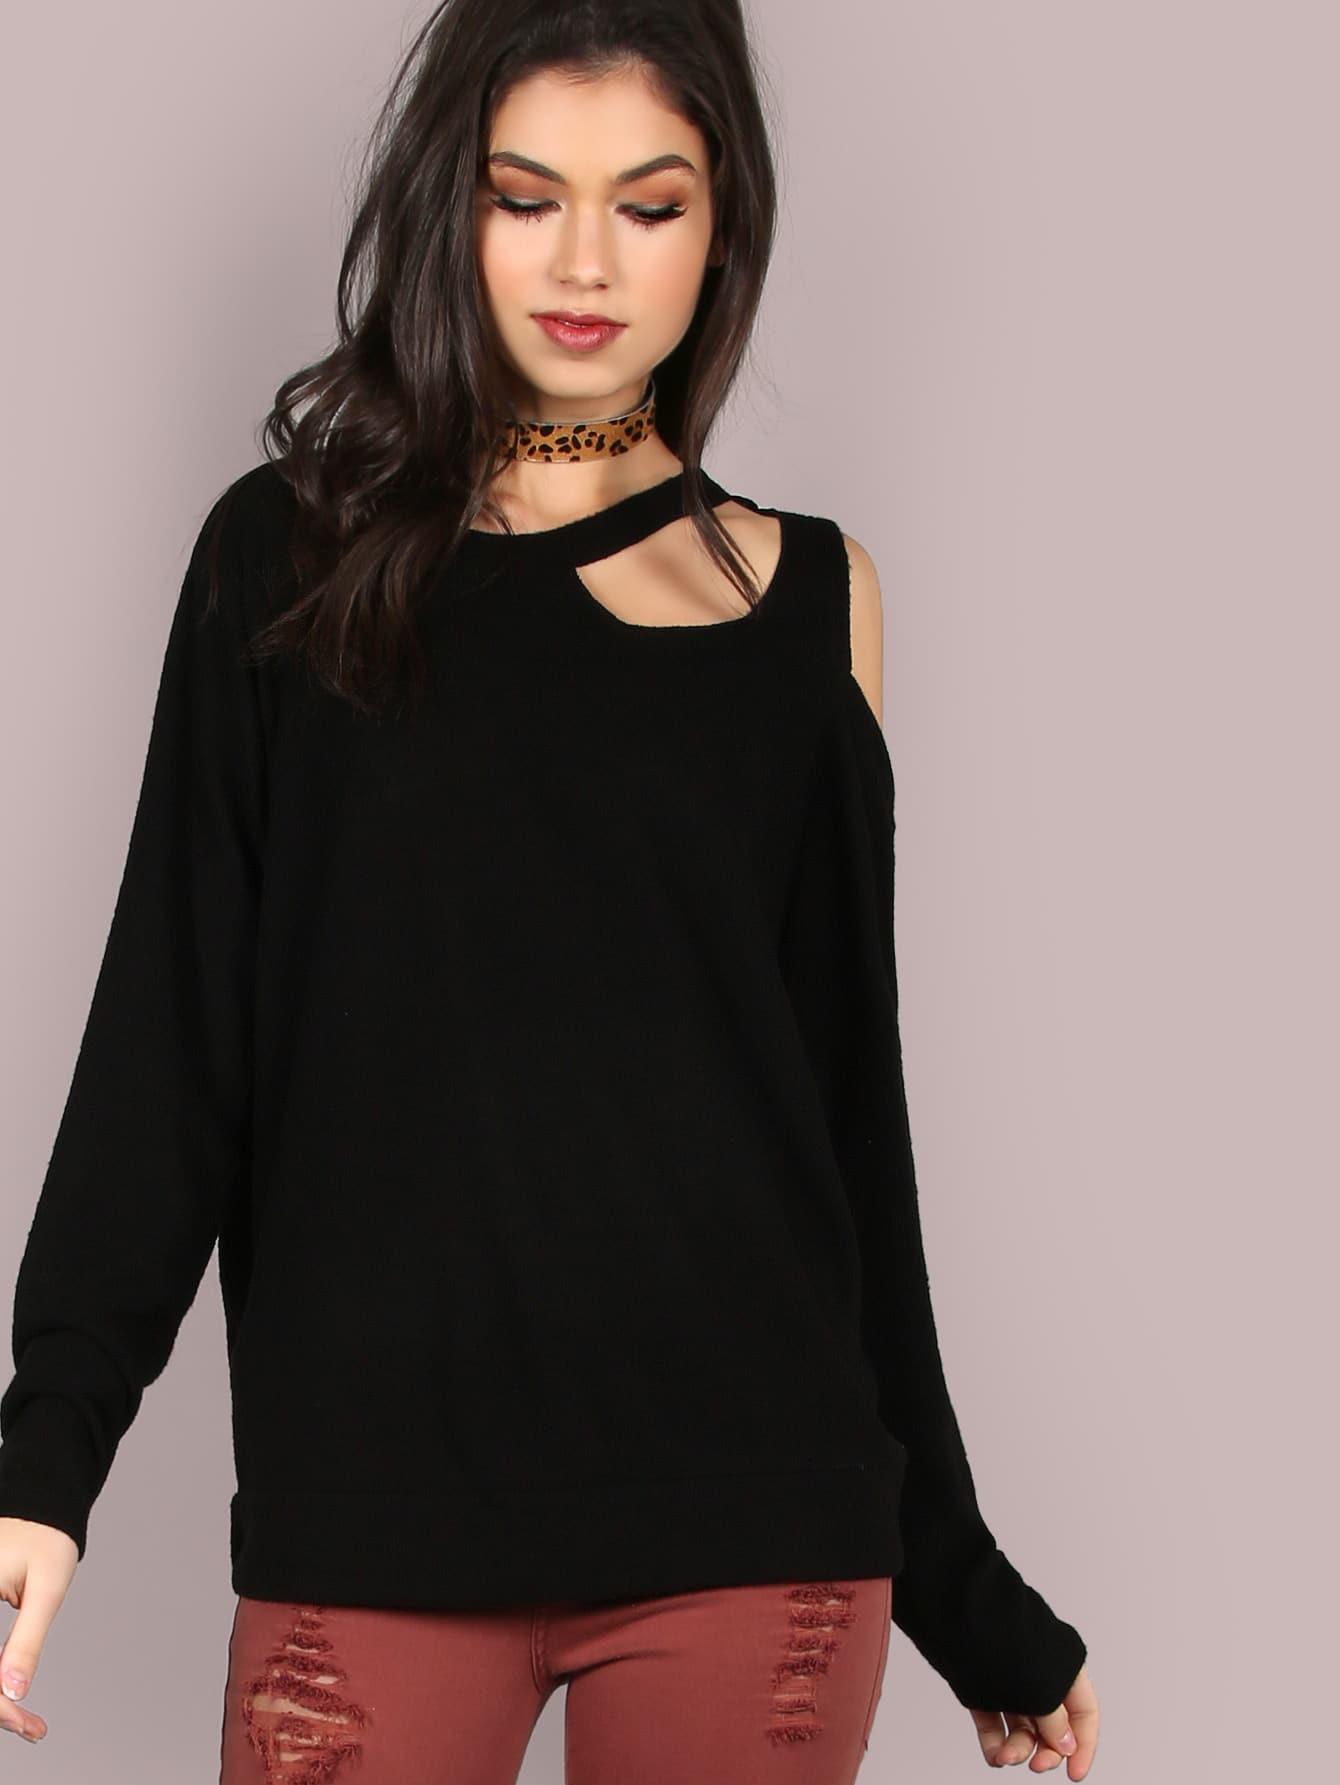 Cut Out Sleeved Soft Fleece Top BLACK sohni wicke джерри агент 8 зарядный